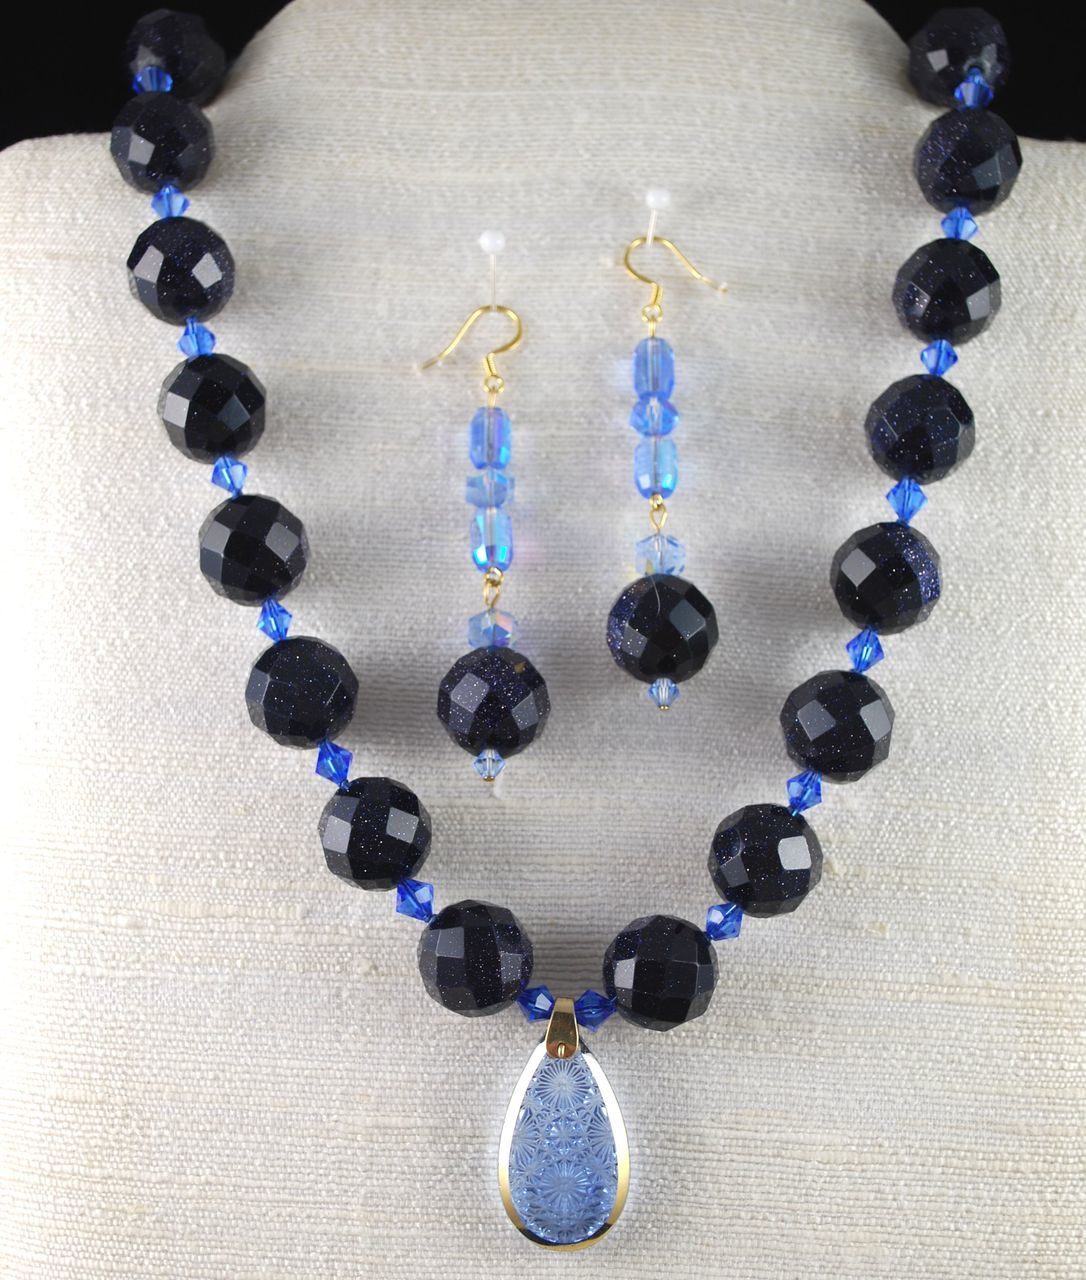 Enchanting Jewelry Creations image 61